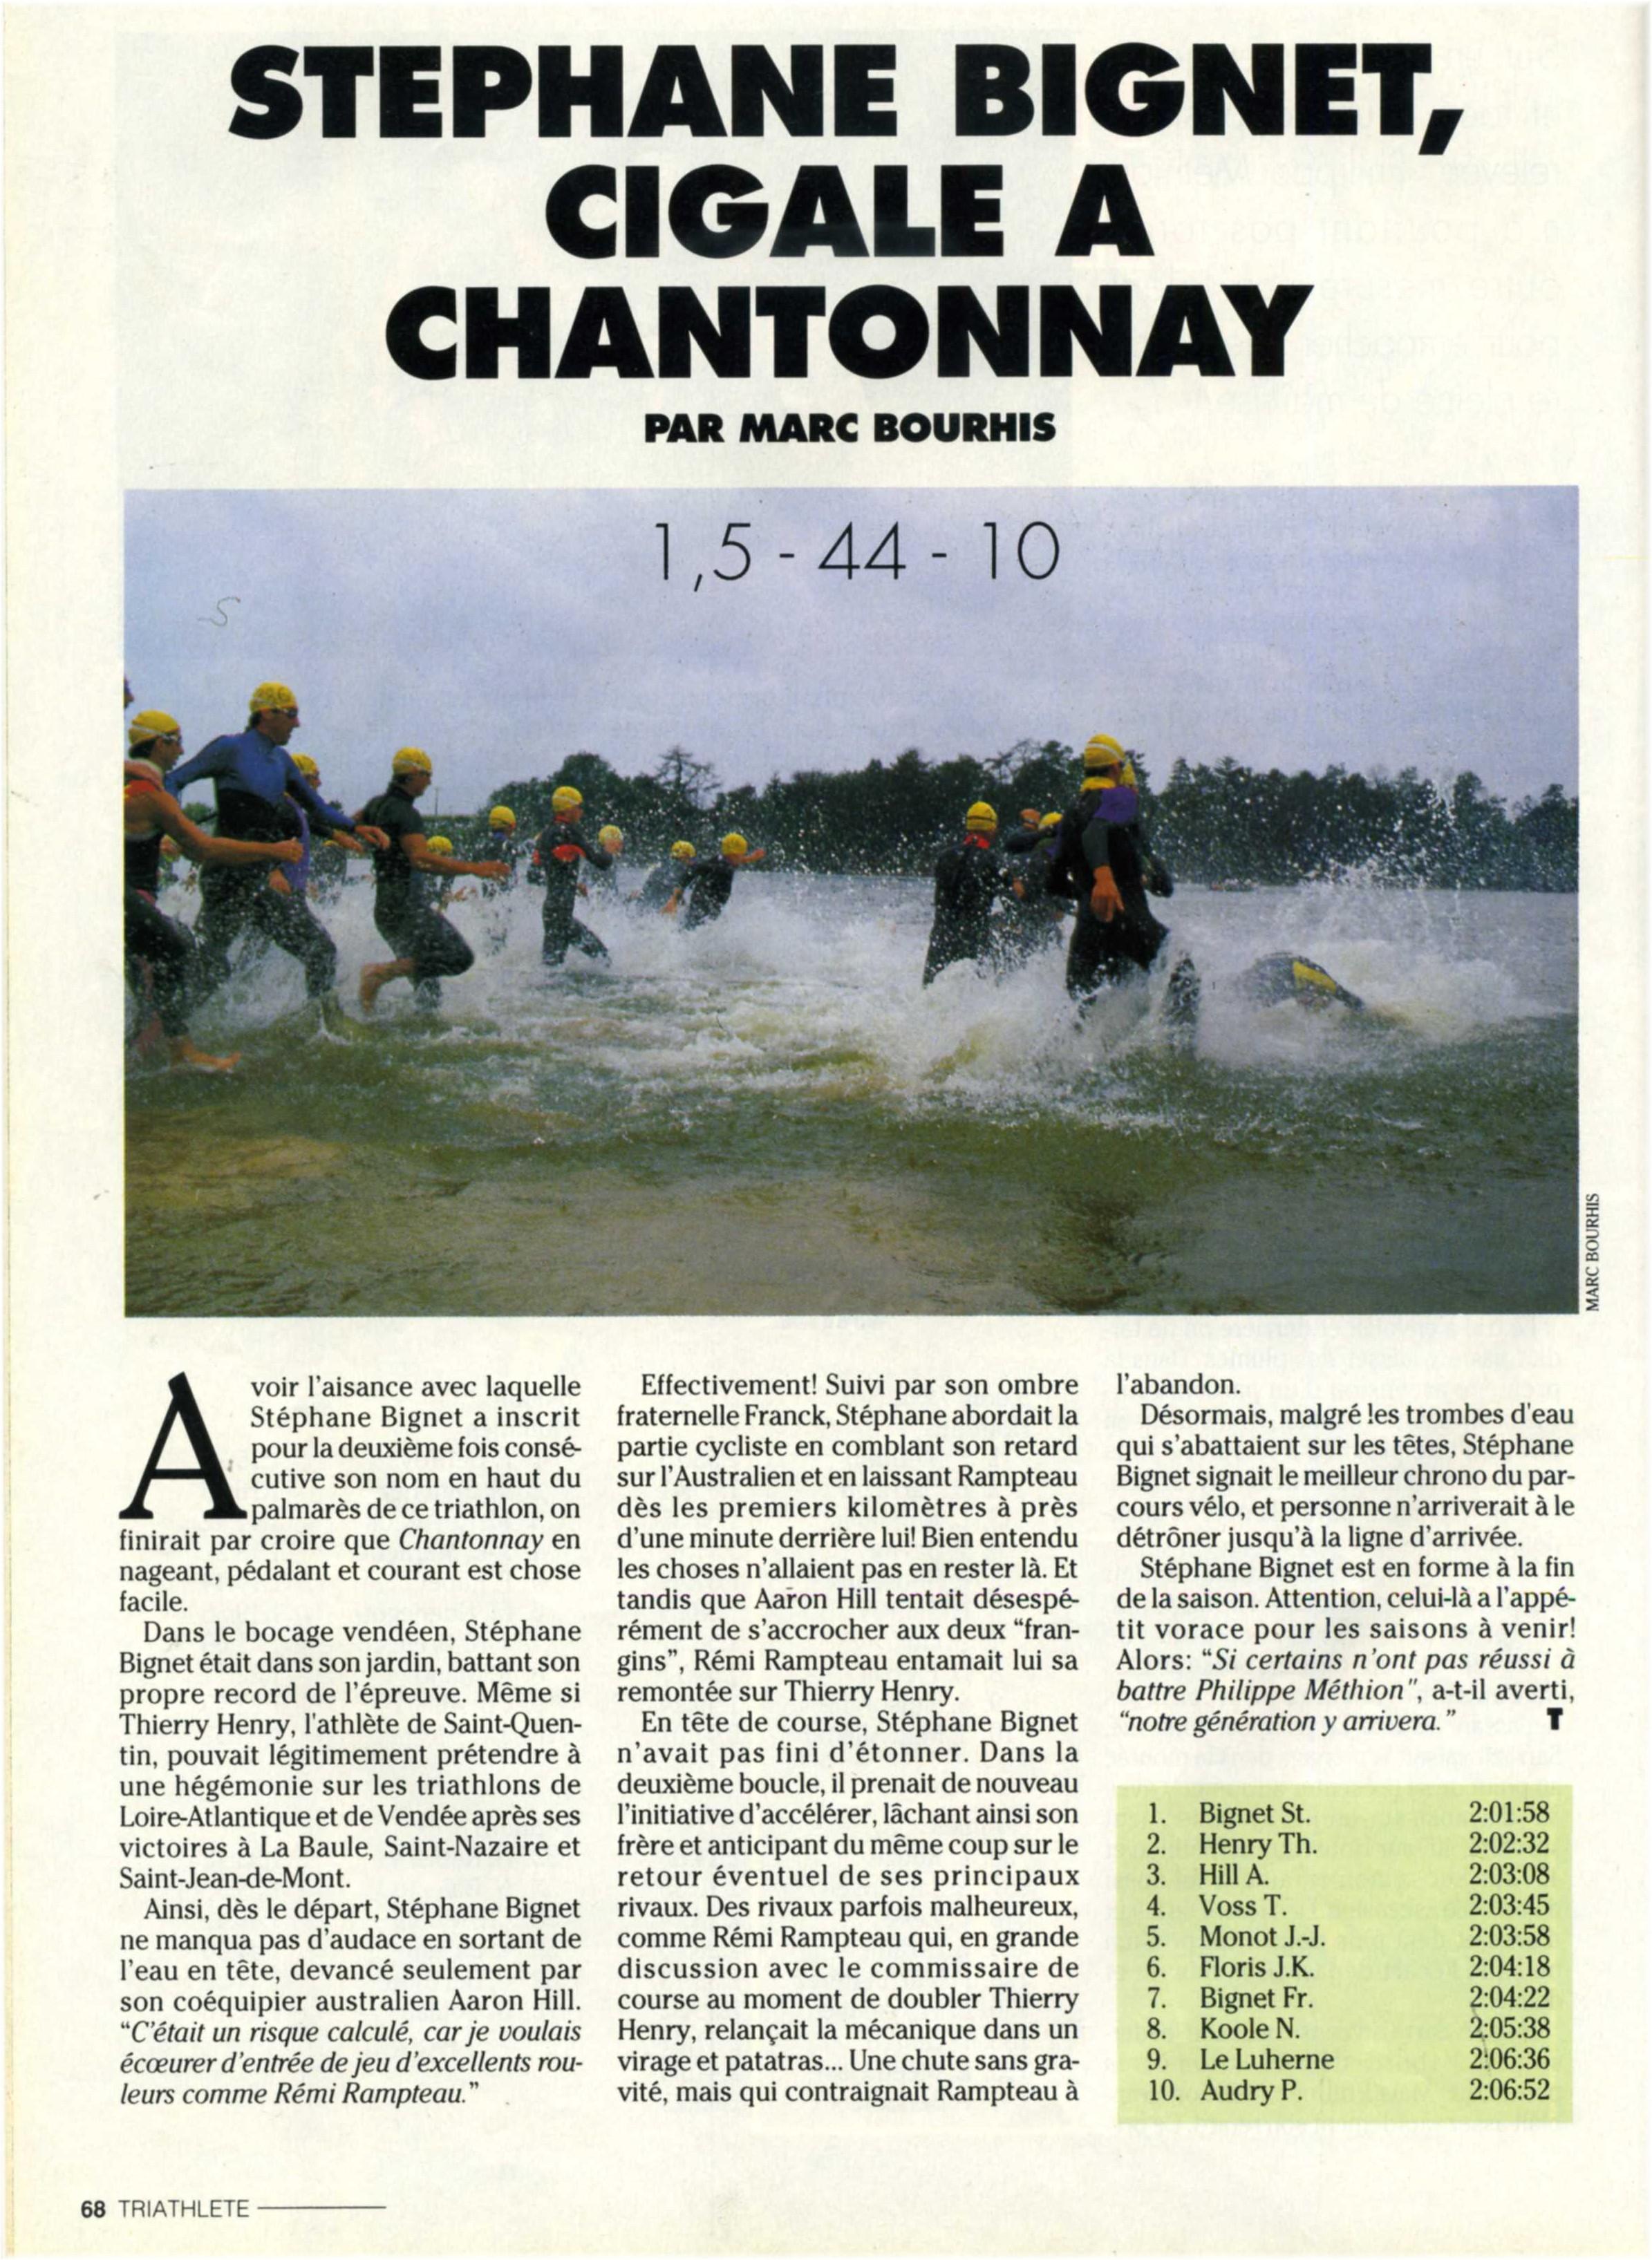 img[A]276_09-aout-1992_chantonnay